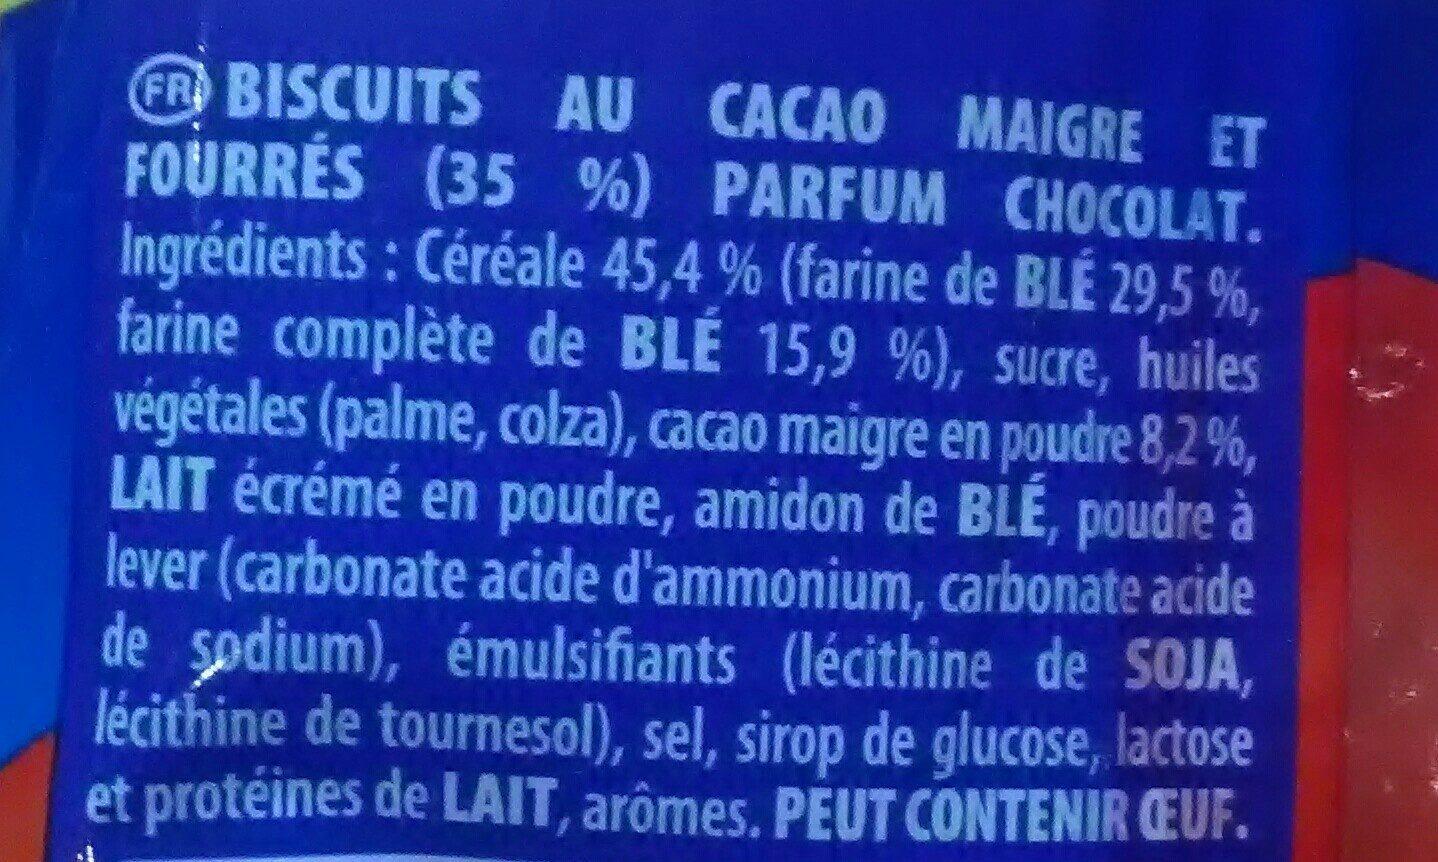 Prince goût tout choco - Ingredientes - fr